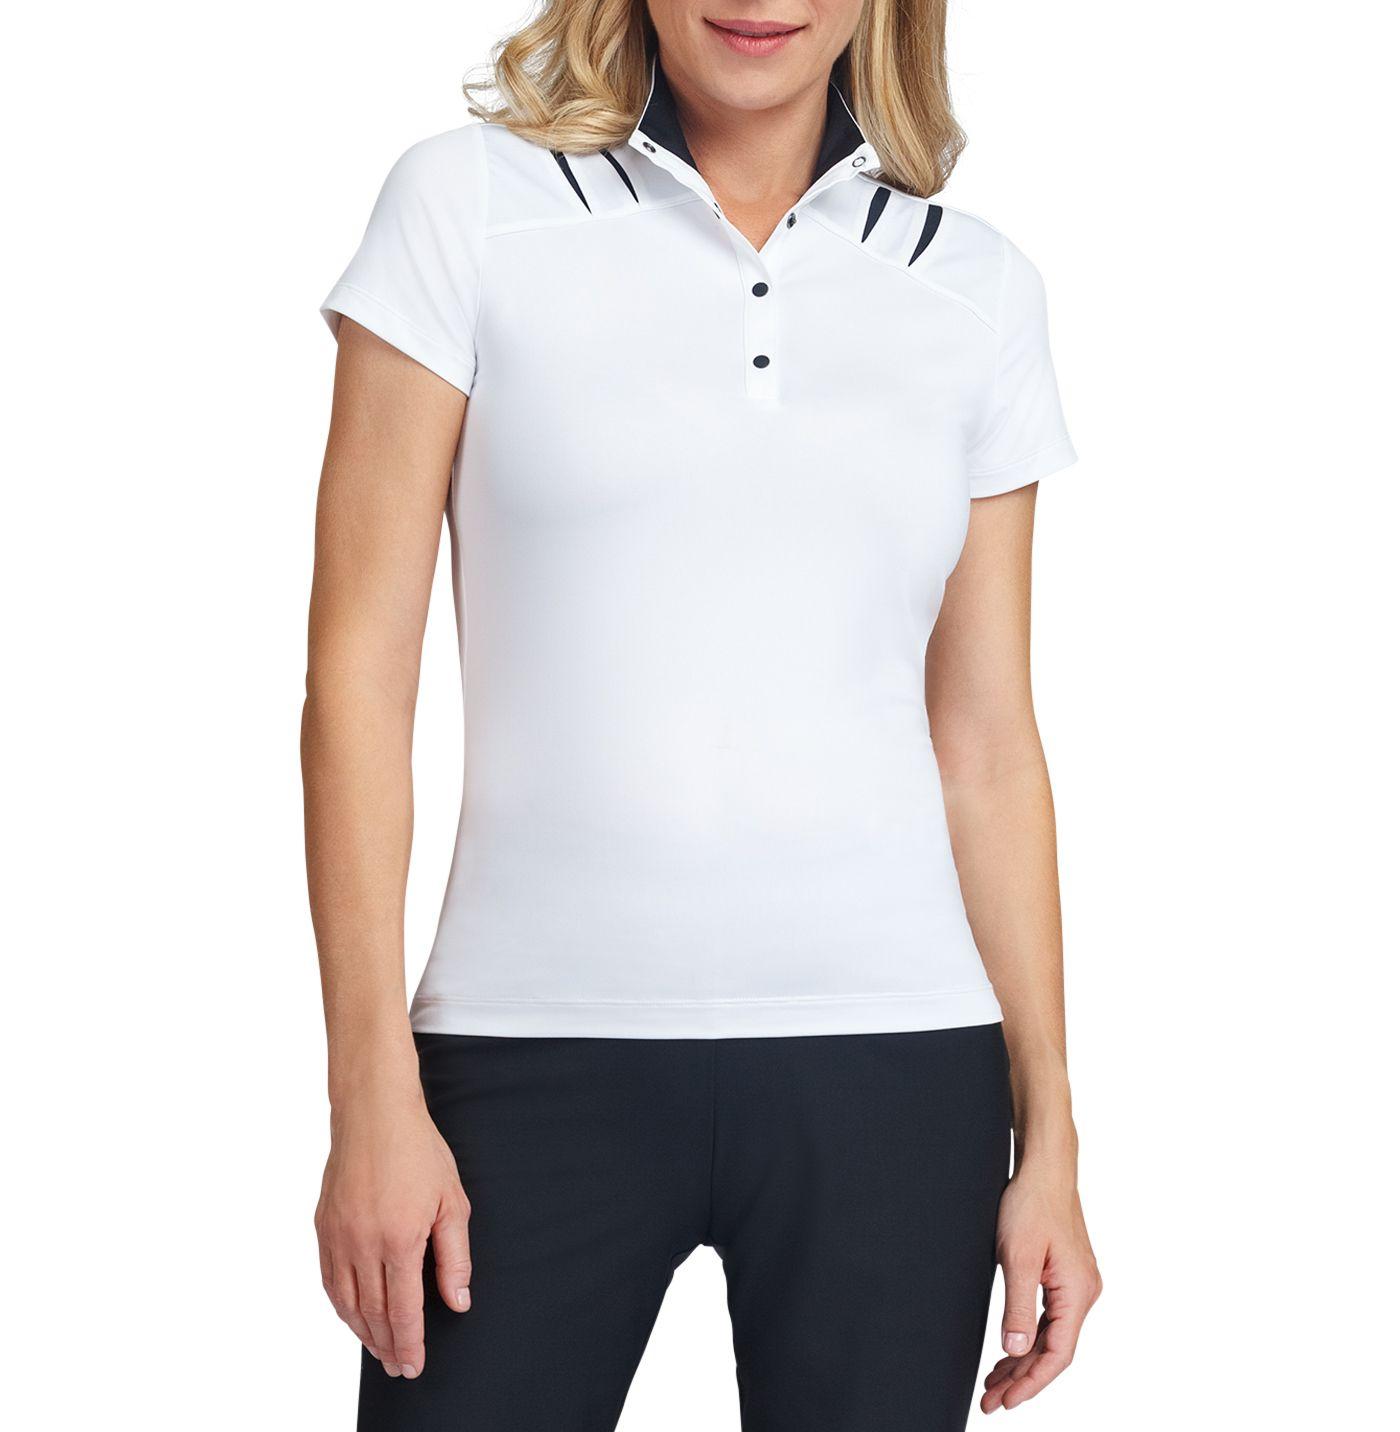 Tail Women's Snap Button Mock Neck Golf Polo